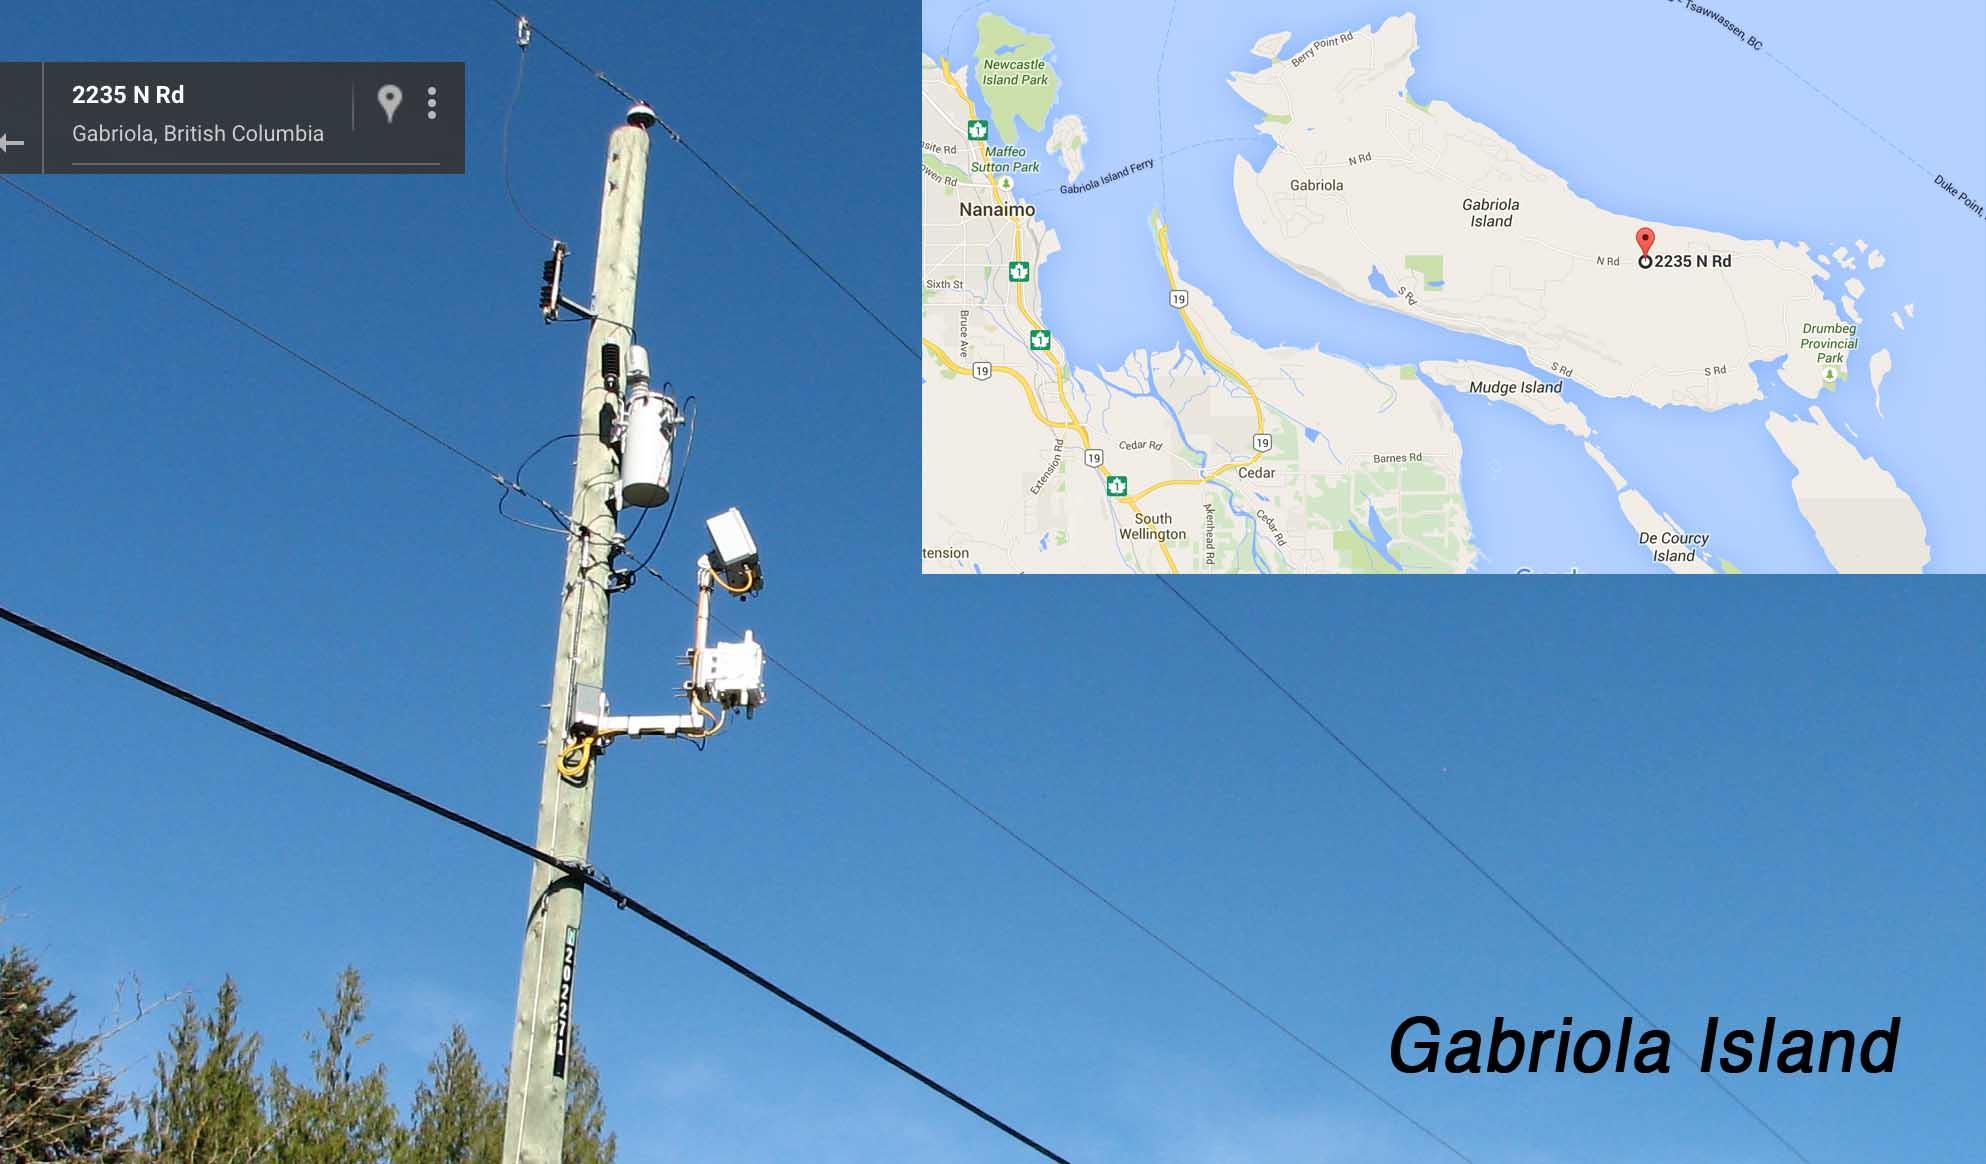 Gabriola Island - BC Hydro Cisco Itron Collector